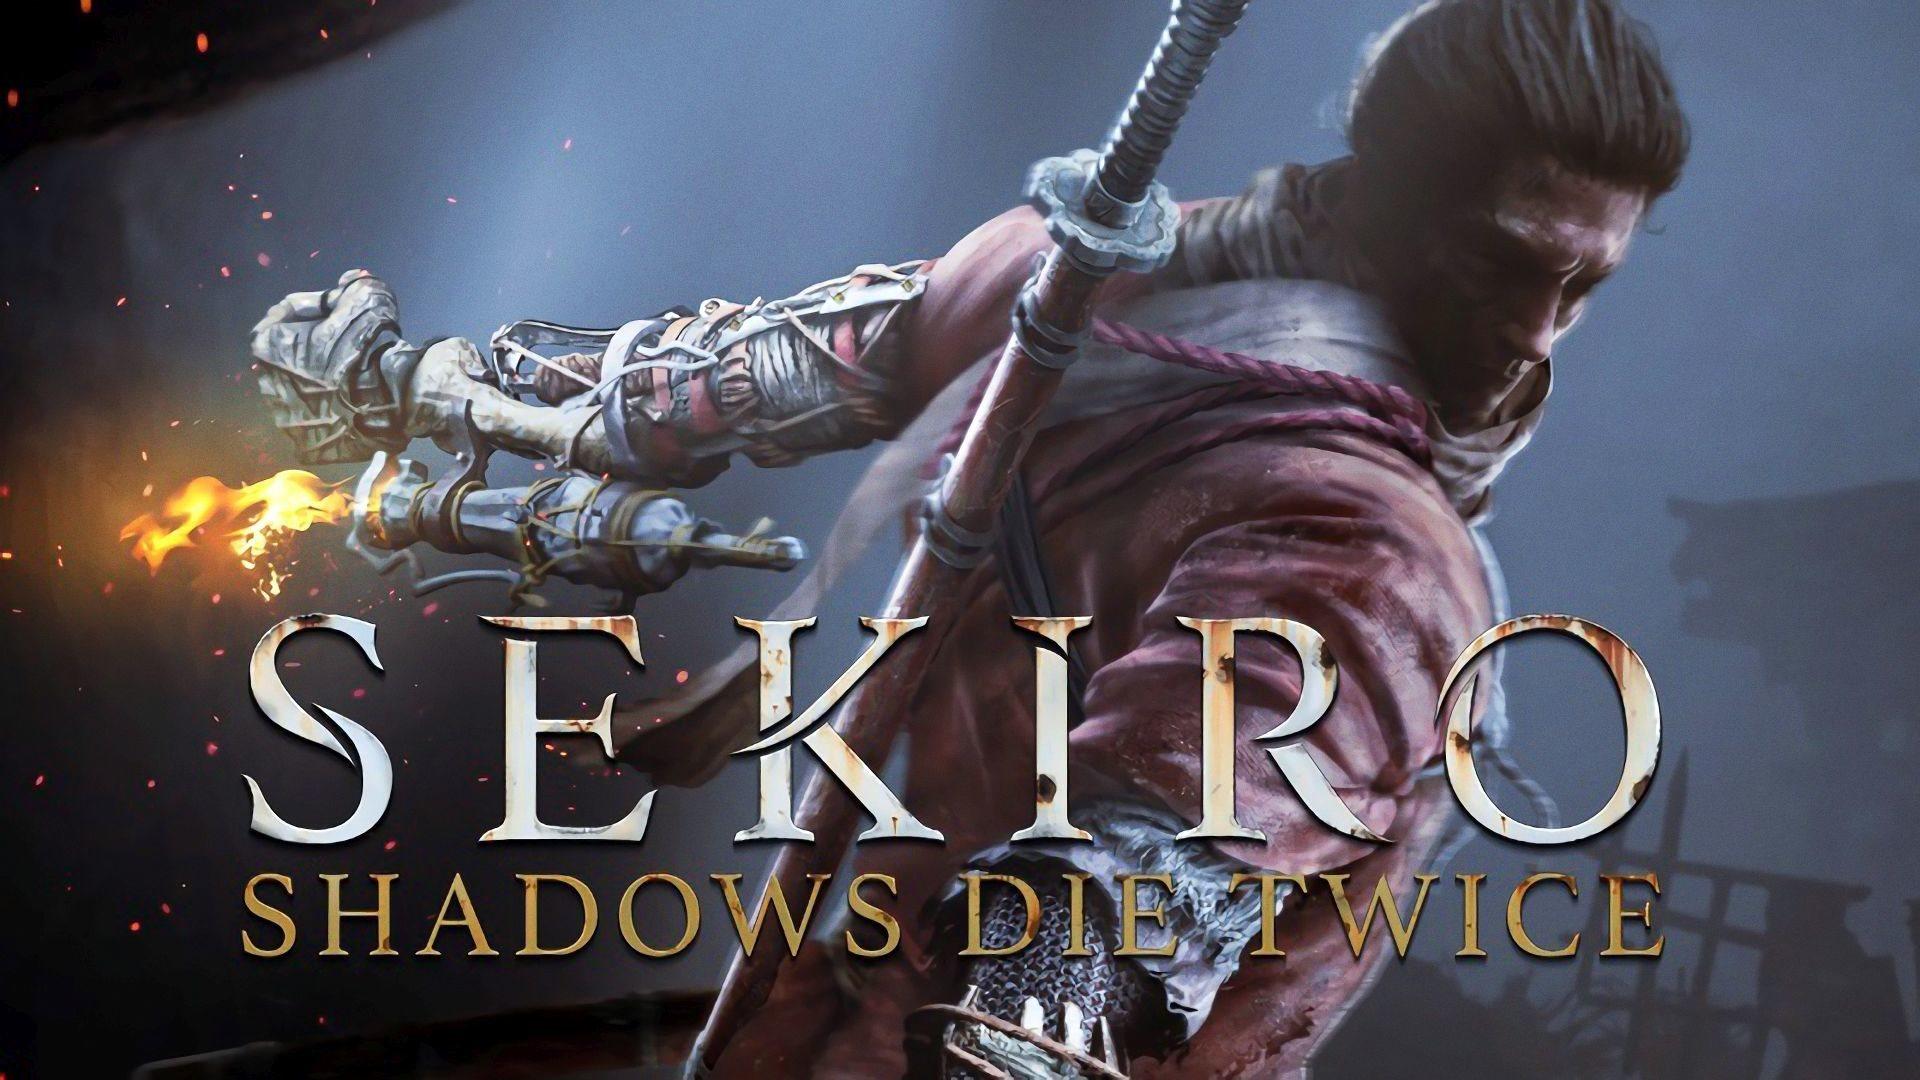 Sekiro: Shadows Die Twice; screenshot: wallpaper